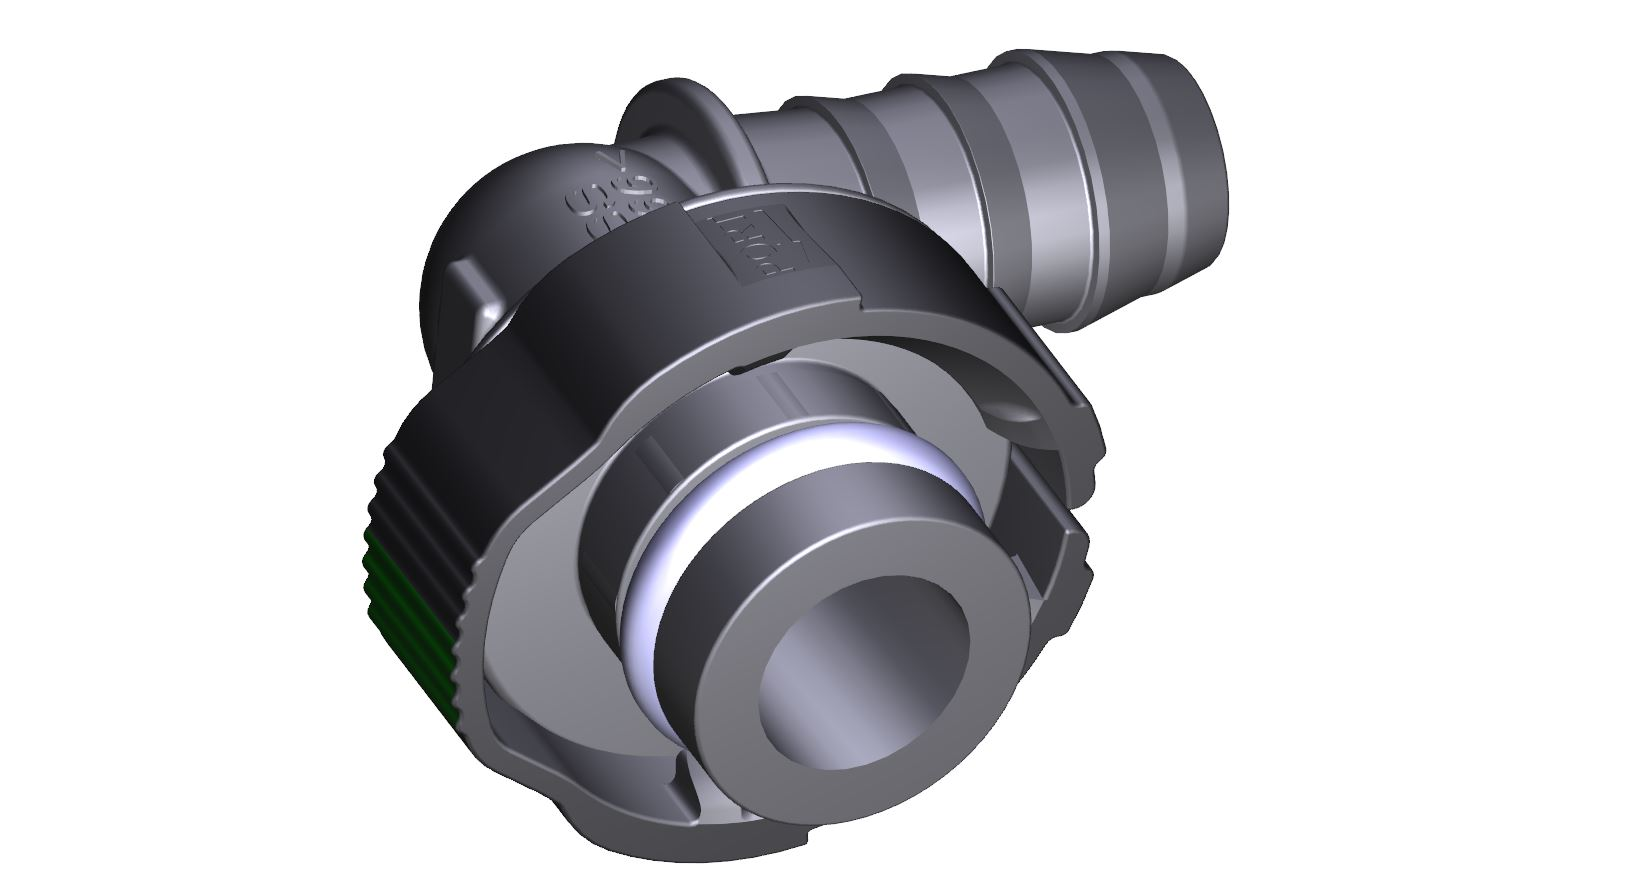 Voss Quick Connect Systems Voss Automotive